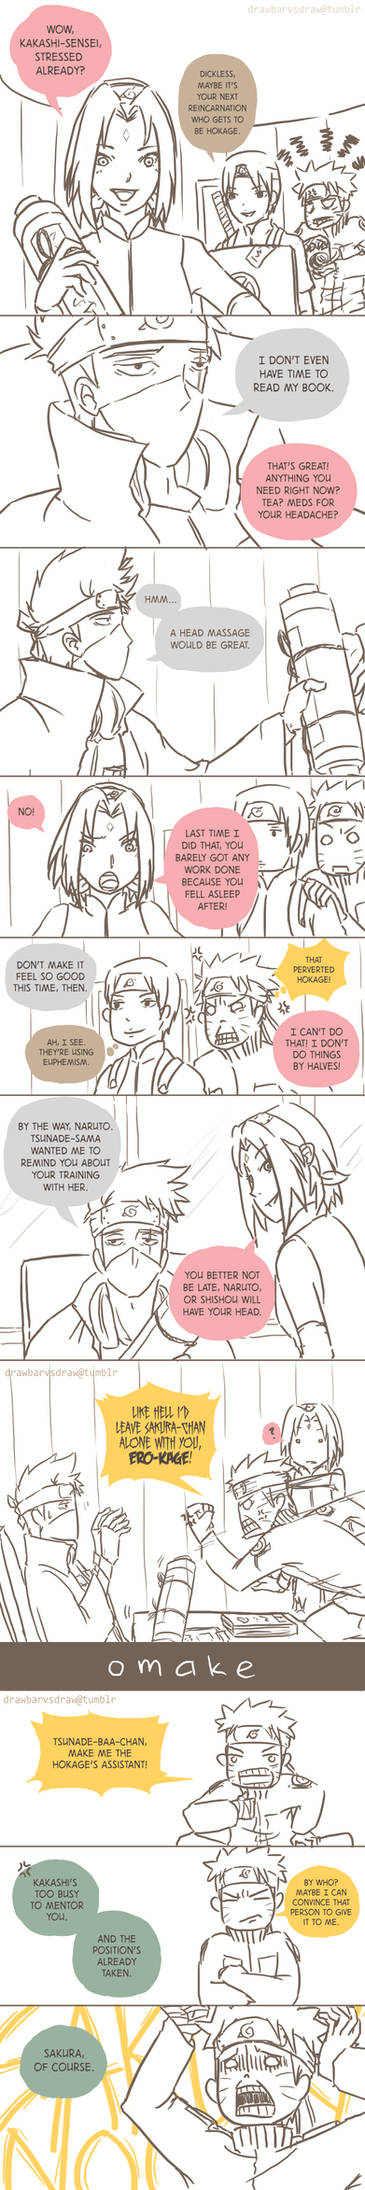 kakasaku - massage (SPOILER ALERT!)